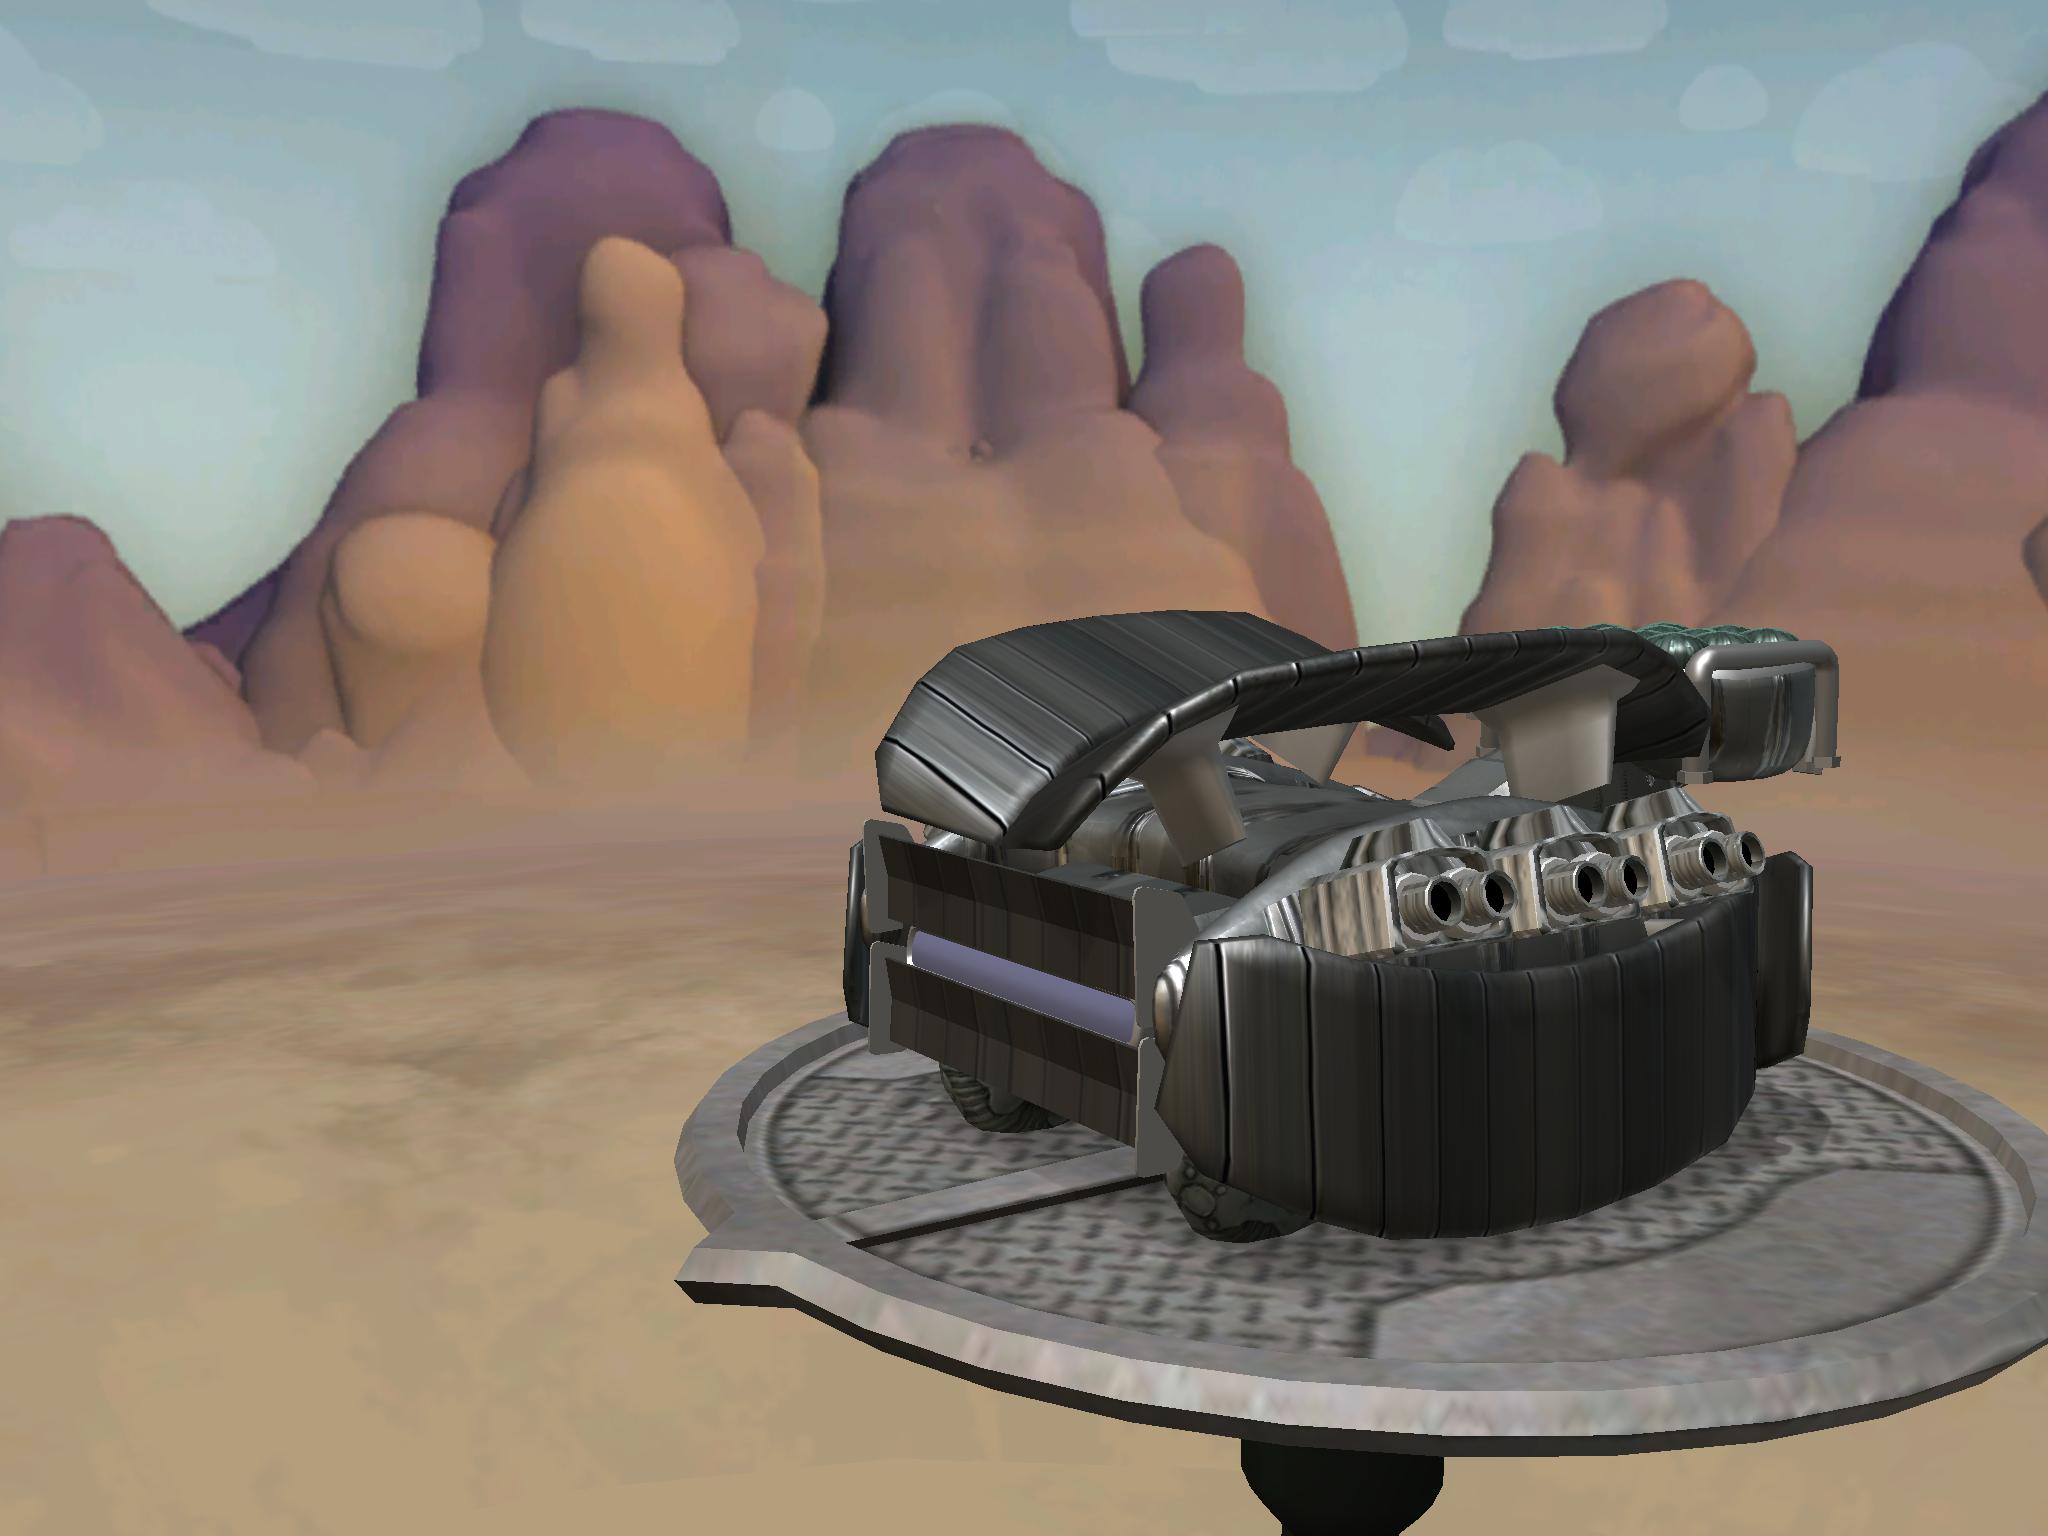 Vehiculo Bombardero Blindado[O8][T] Spore-23-04-2020-14-08-08